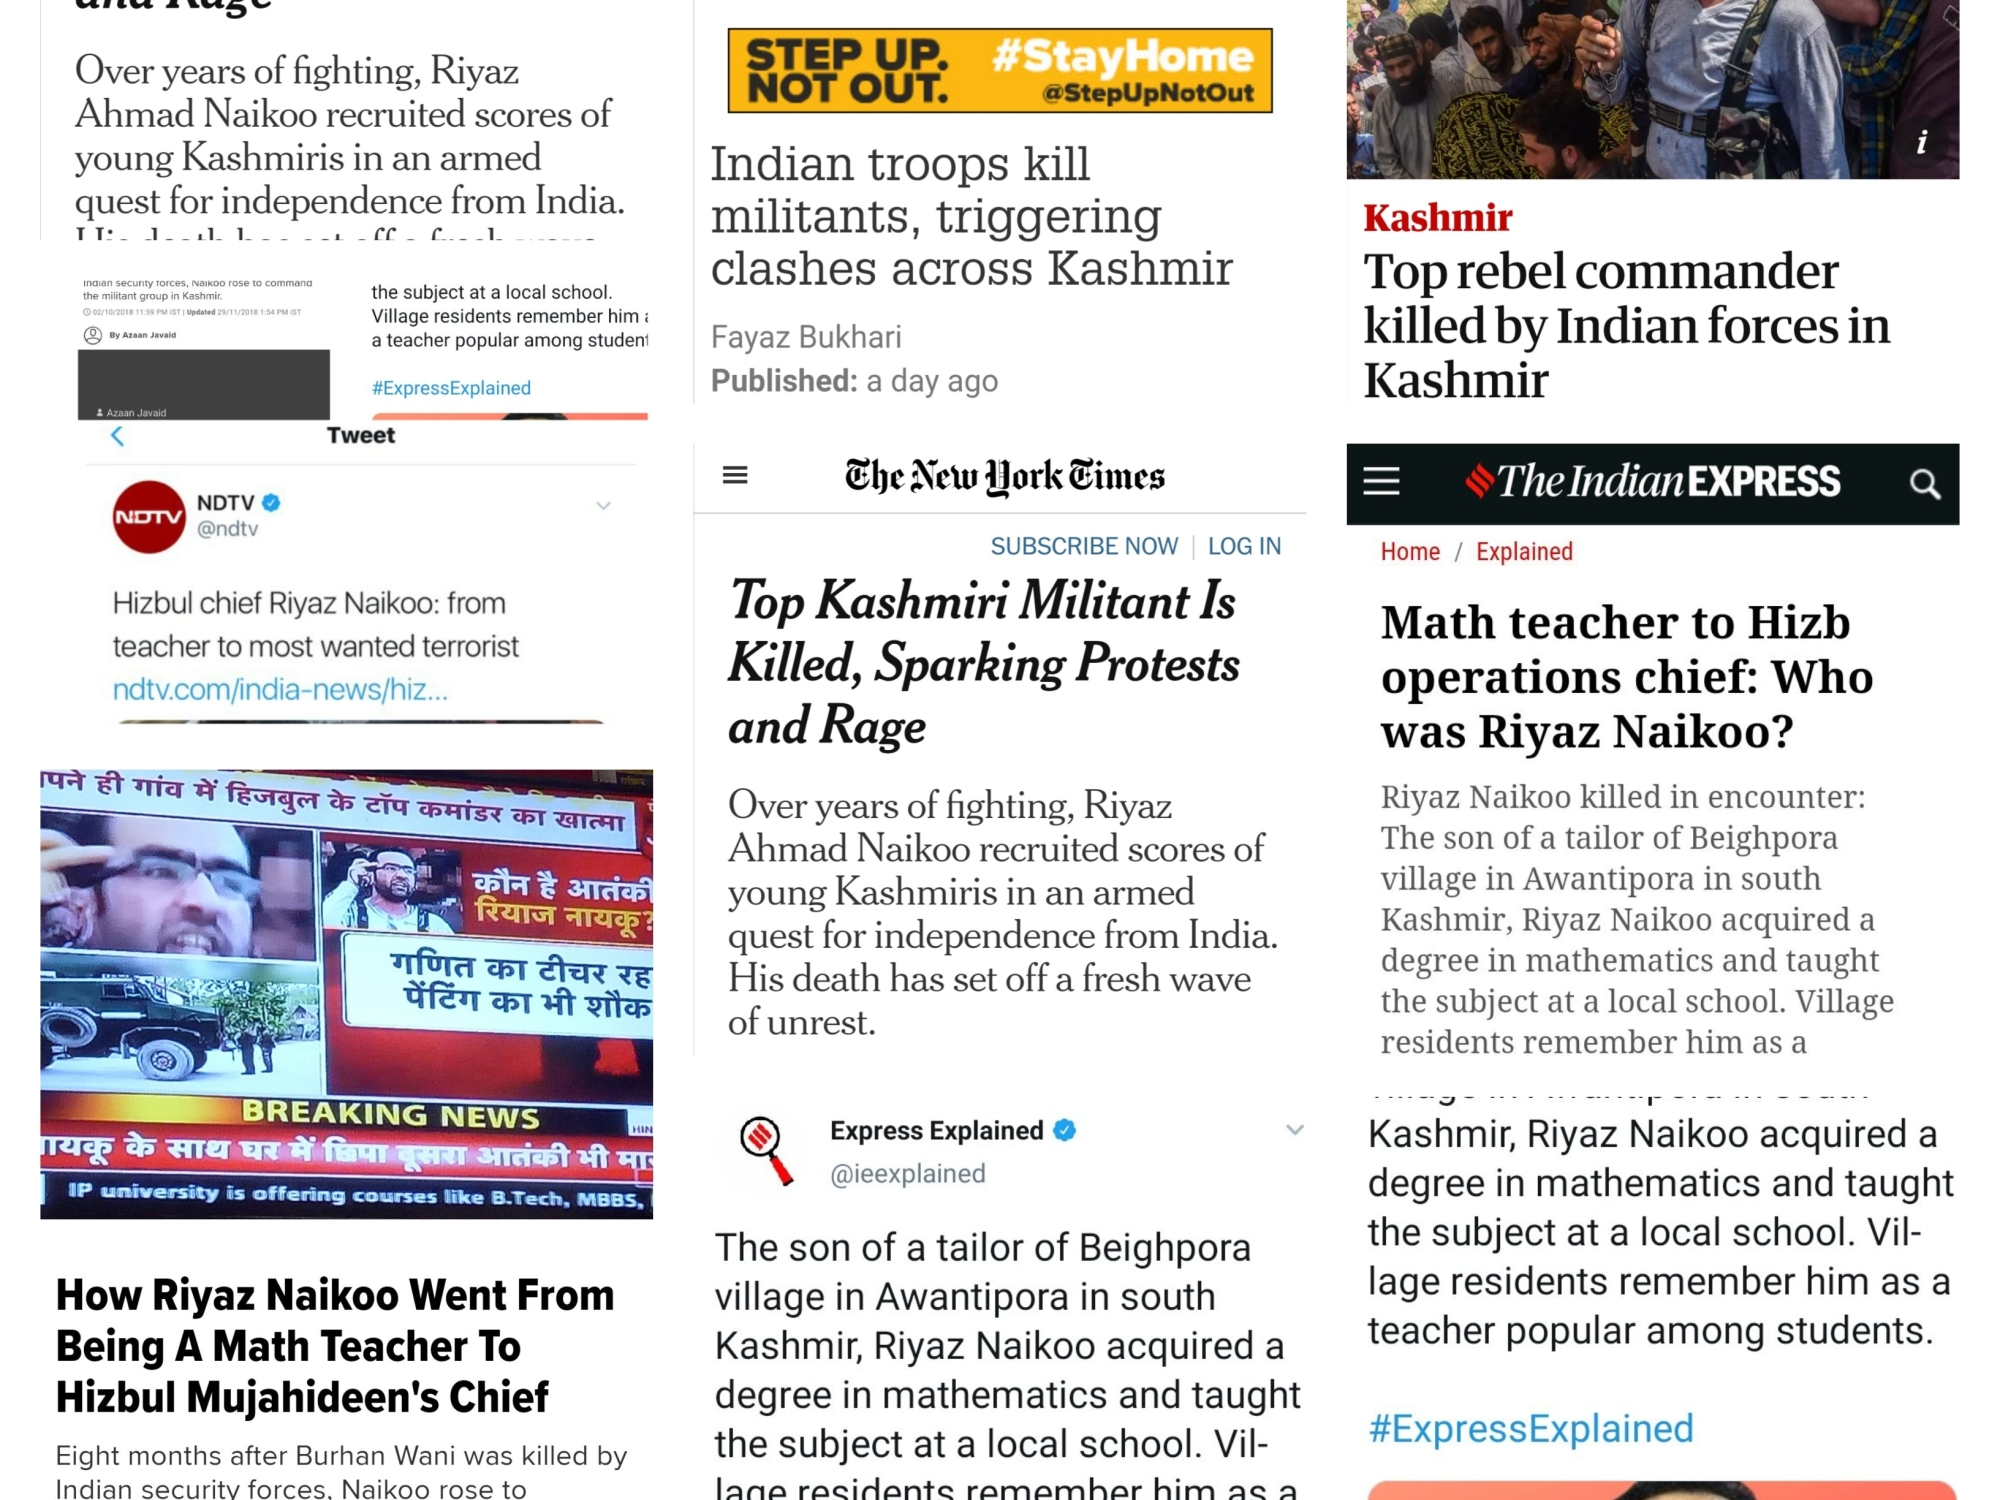 false reporting kashmir martyrs azaadi freedom fighters security forces riyaz naikoo terrorist hizbul mujahidin Hm terror outfit encounter indian army lutyen media presstitutes International media sickular propaganda